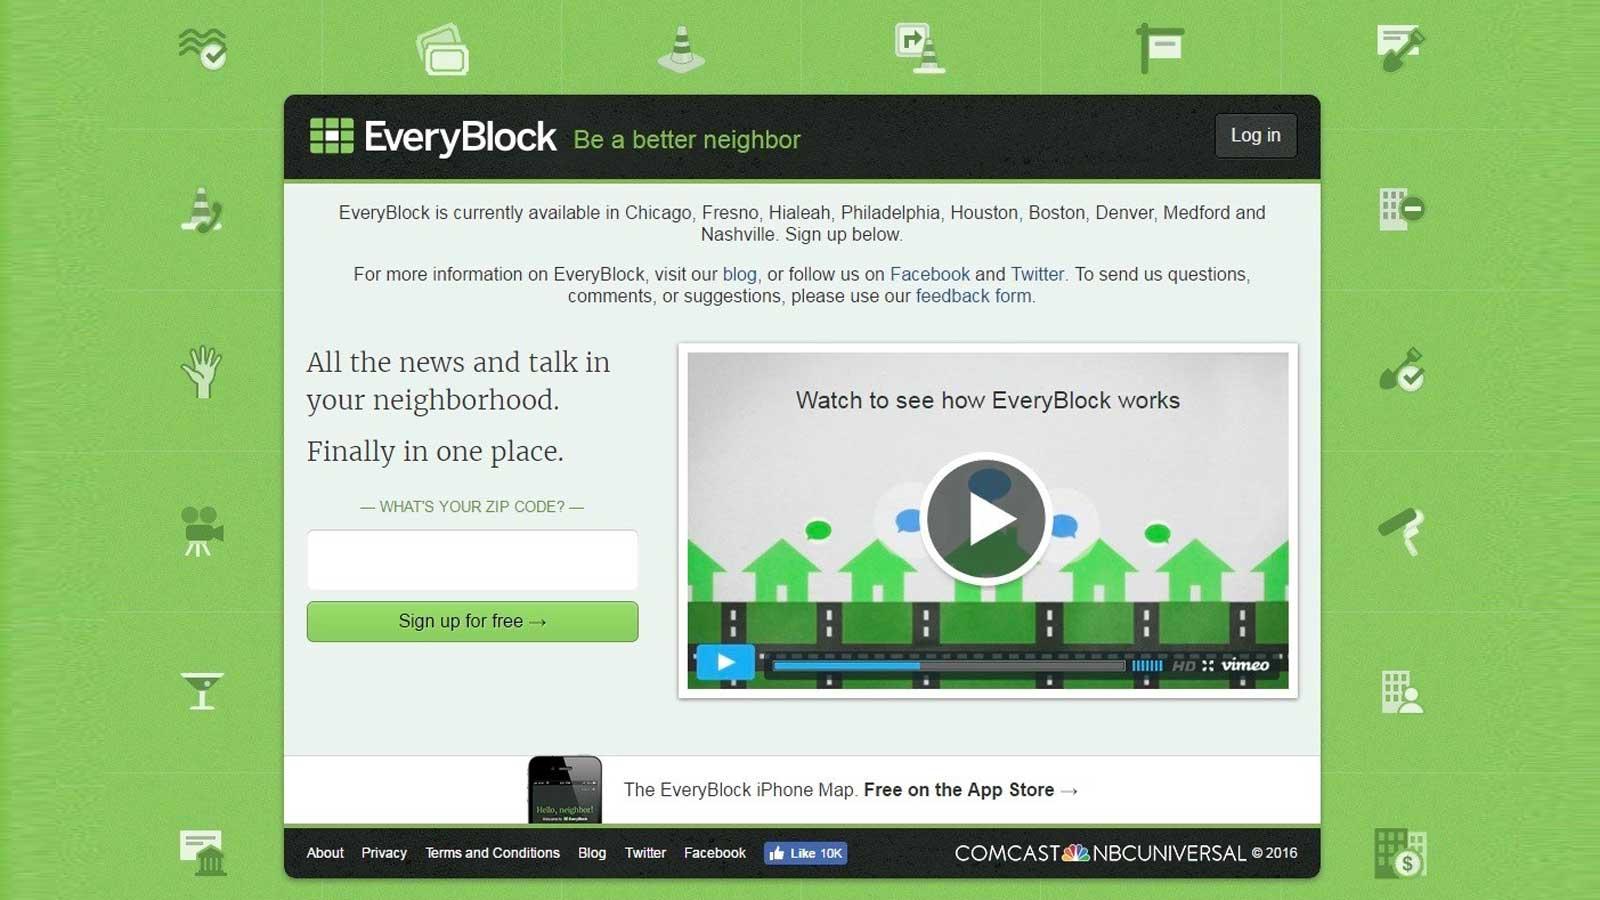 EveryBlock homepage